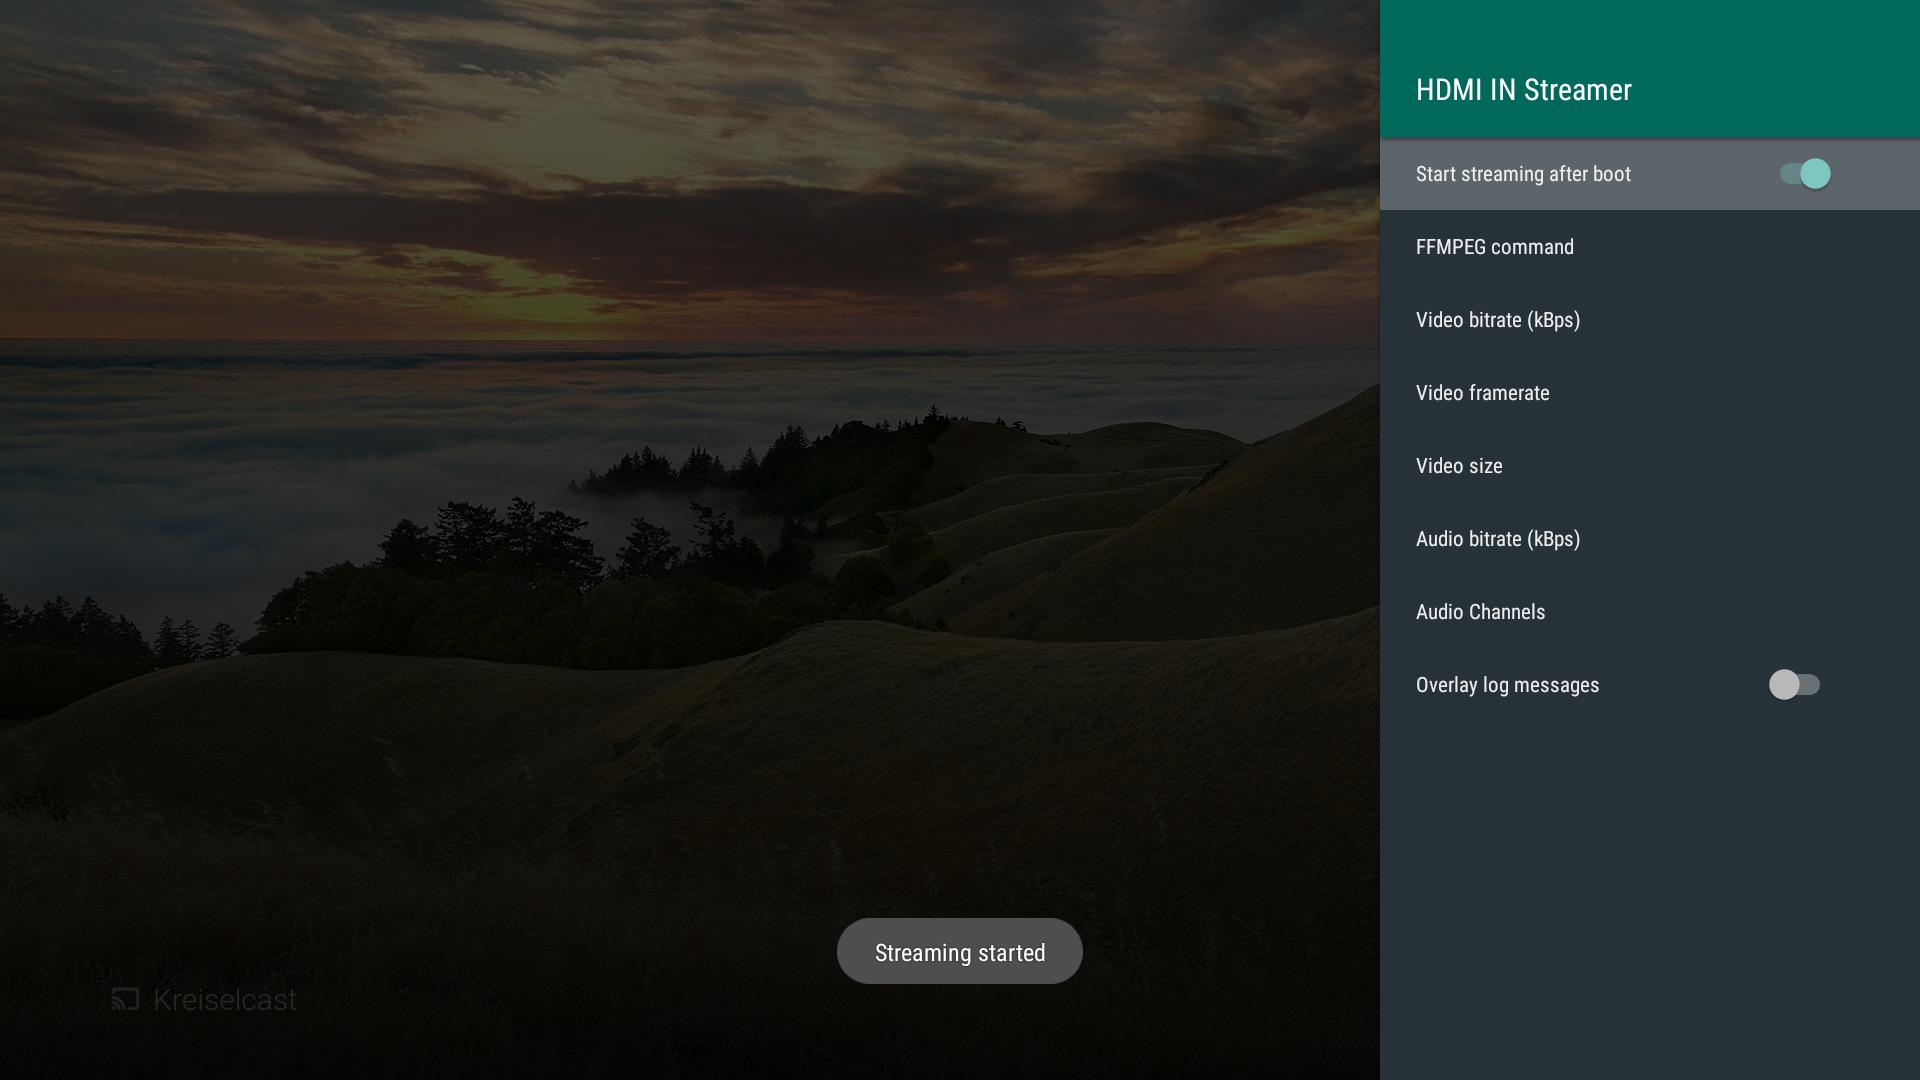 Instreamer App Streams Zidoo X8/X9S/X10 HDMI Video Input to YouTube